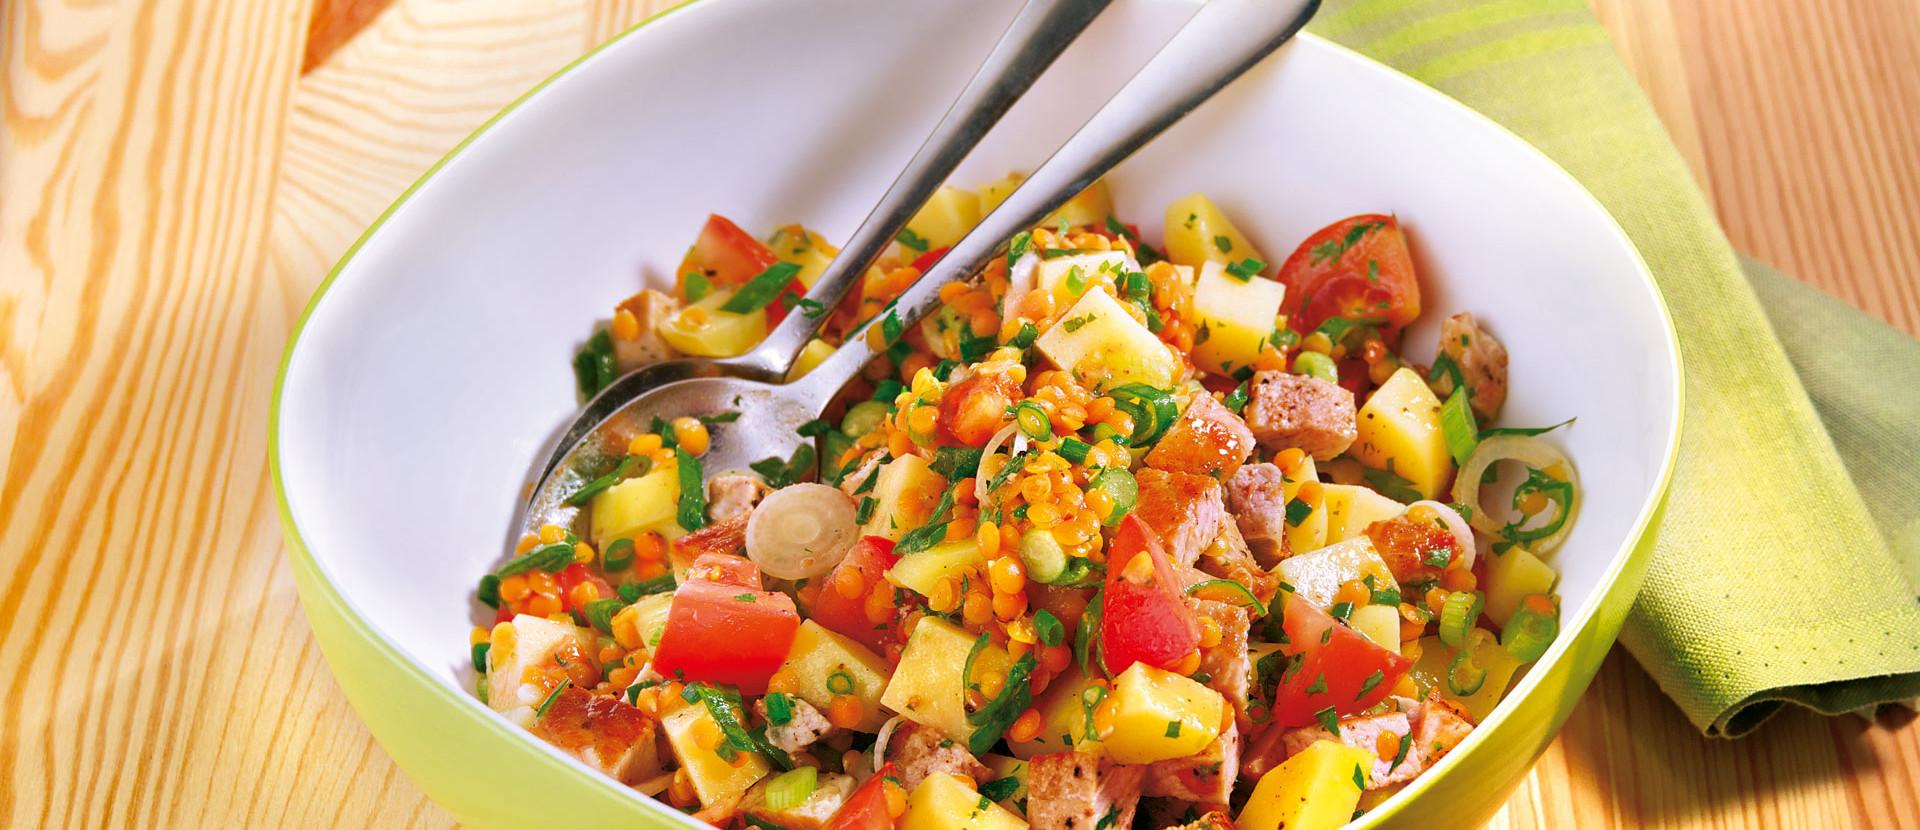 Linsen-Kartoffel-Salat